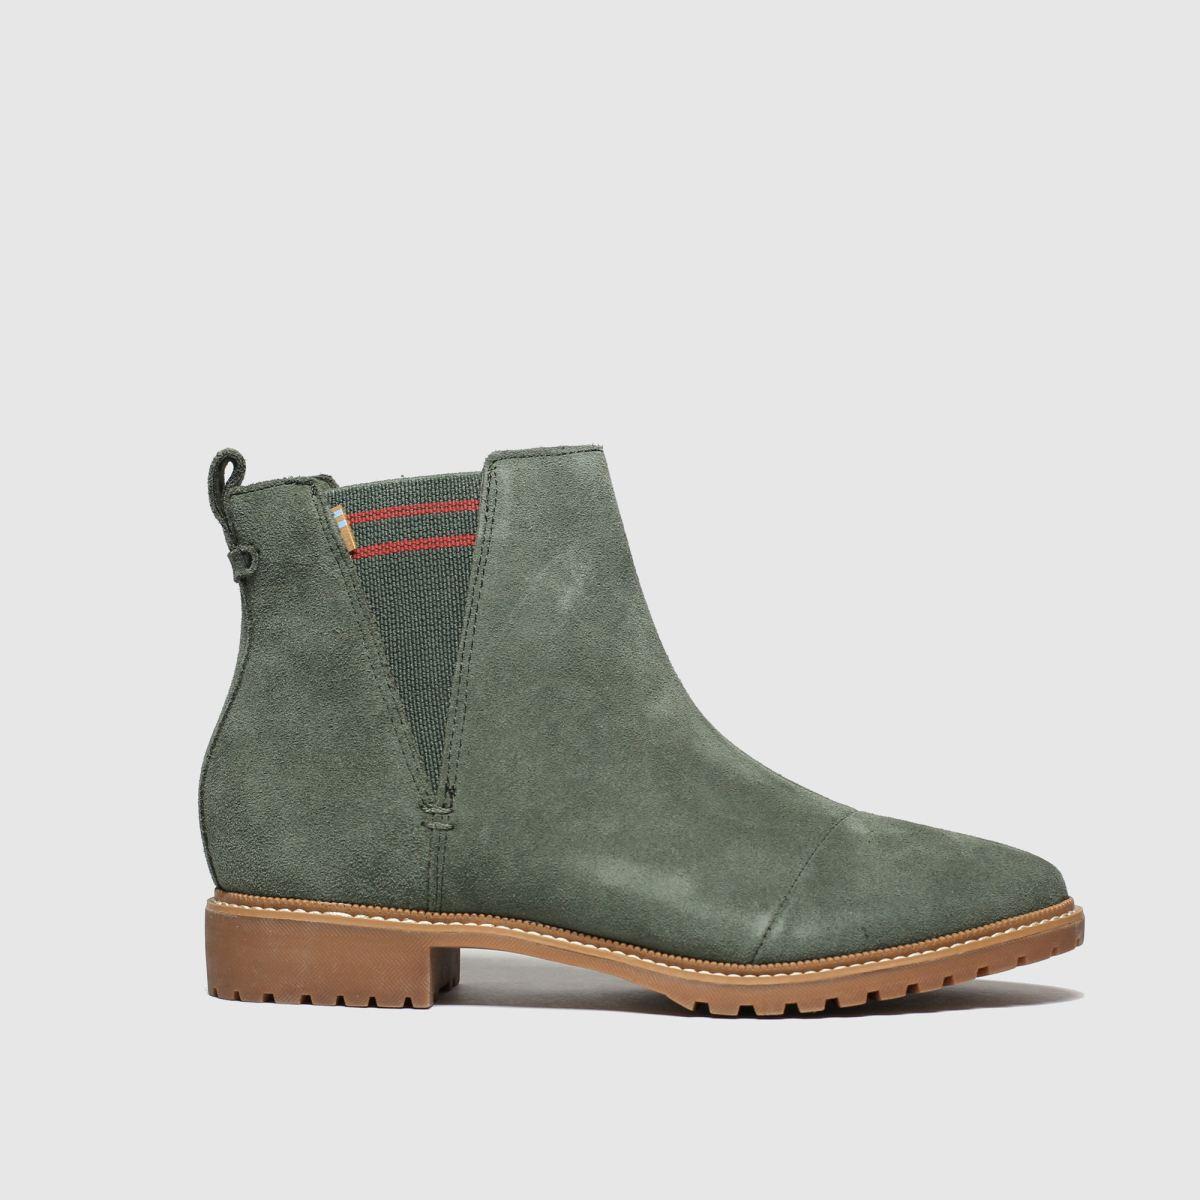 Toms Khaki Cleo Boots